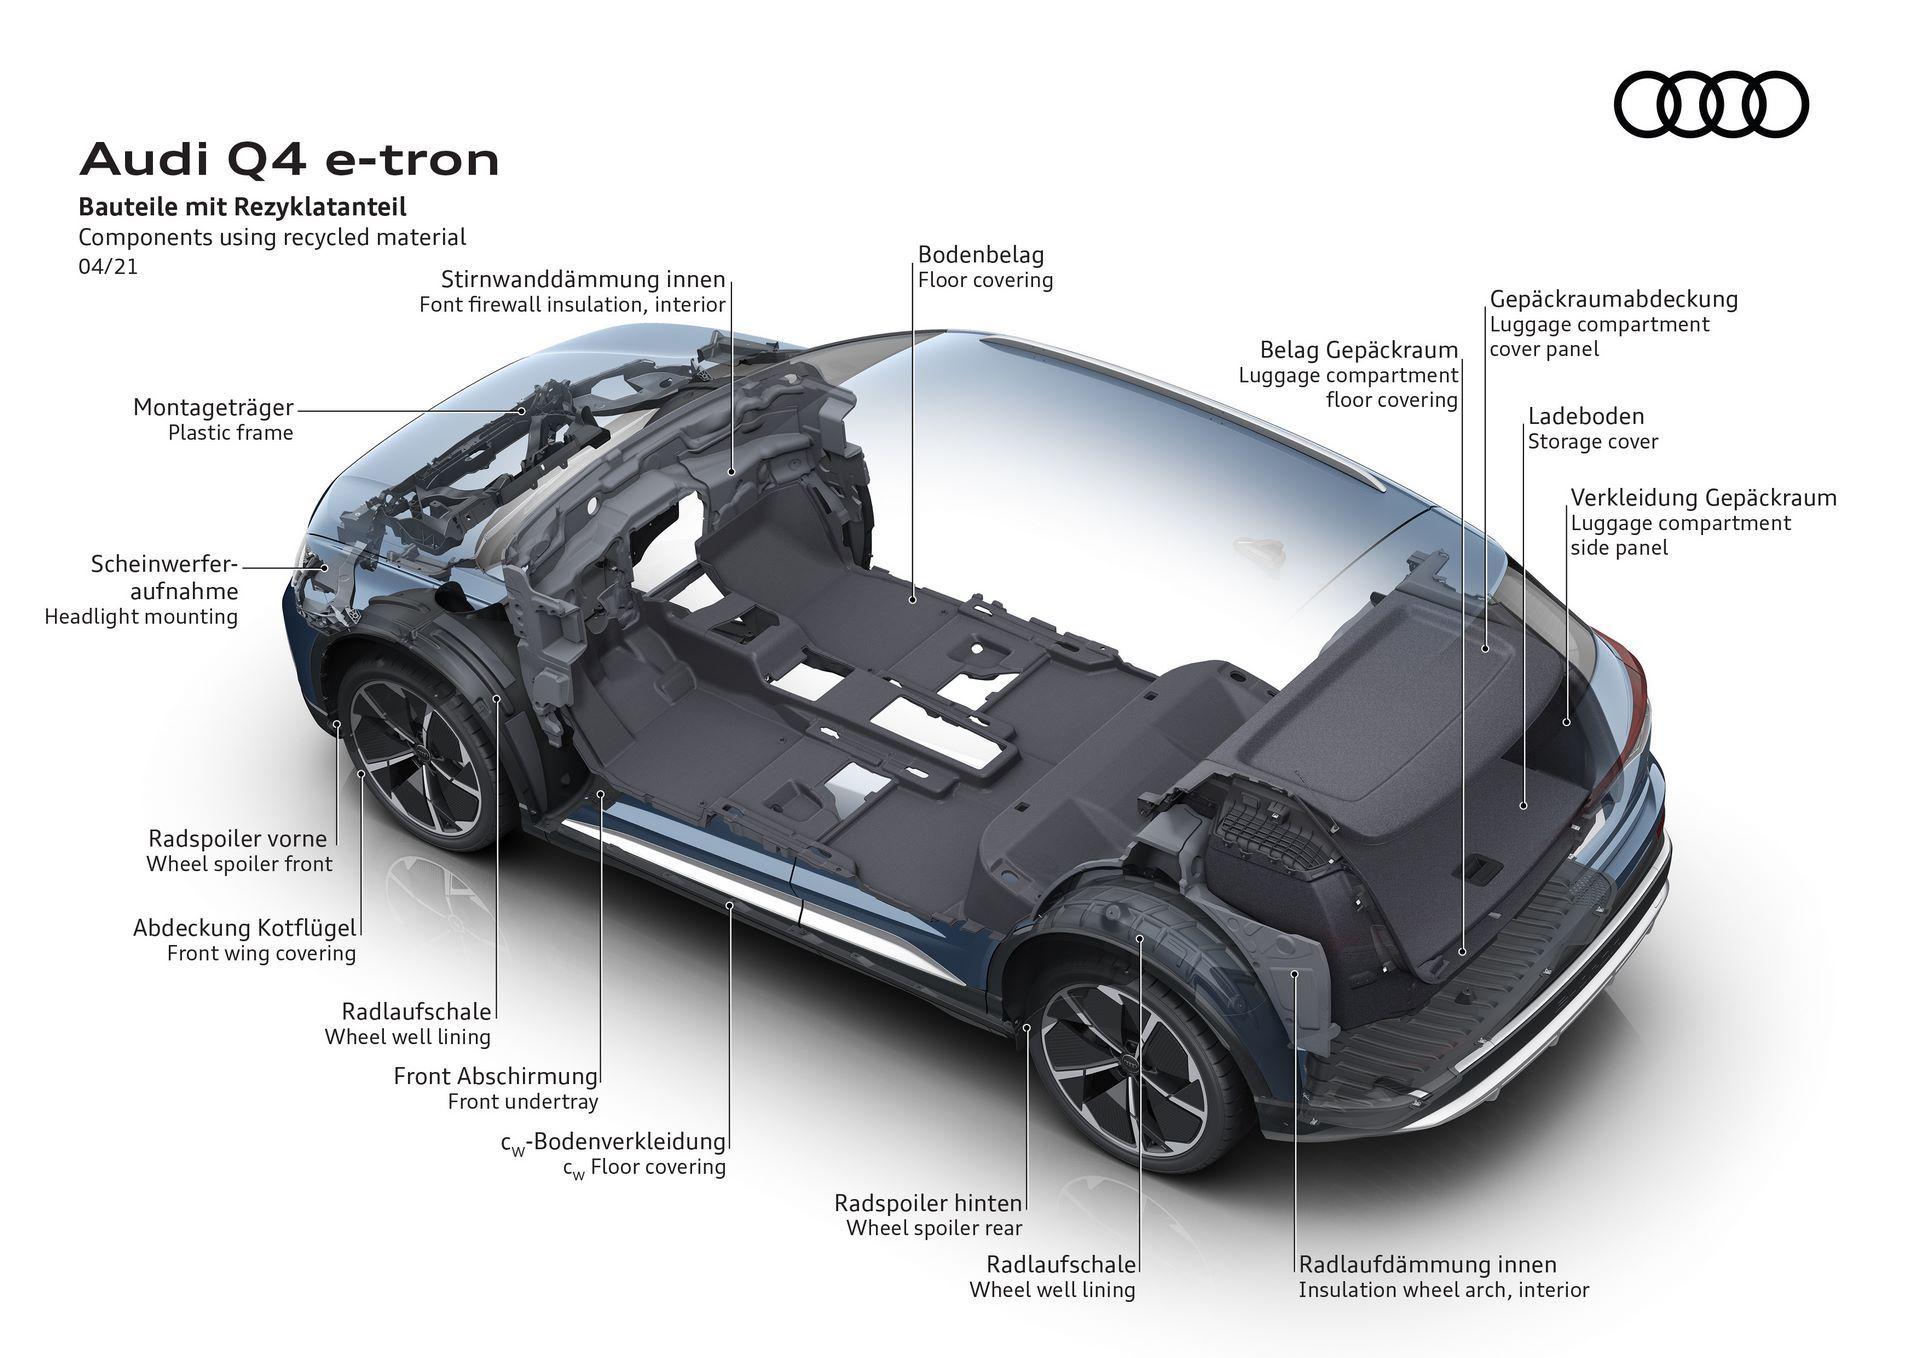 Audi-Q4-e-tron-and-Q4-e-tron-Sportback-98